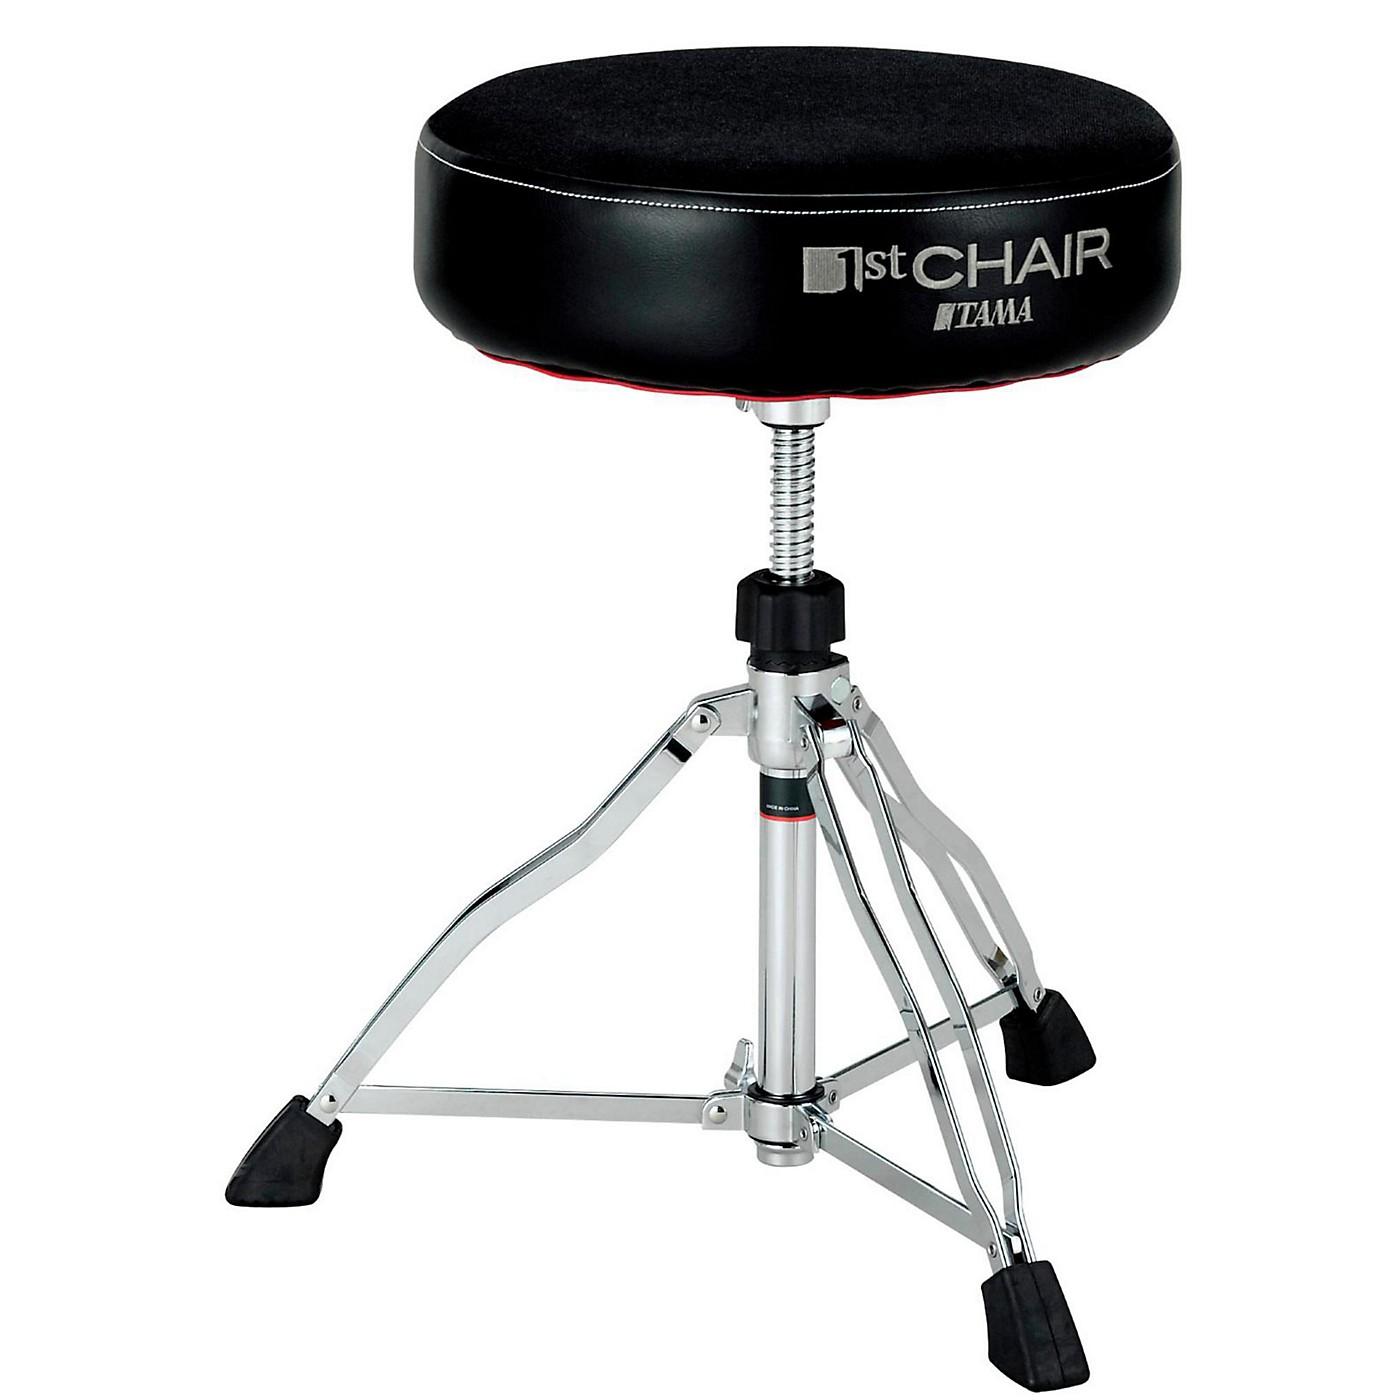 TAMA 1st Chair Round Rider Drum Throne Cloth top thumbnail